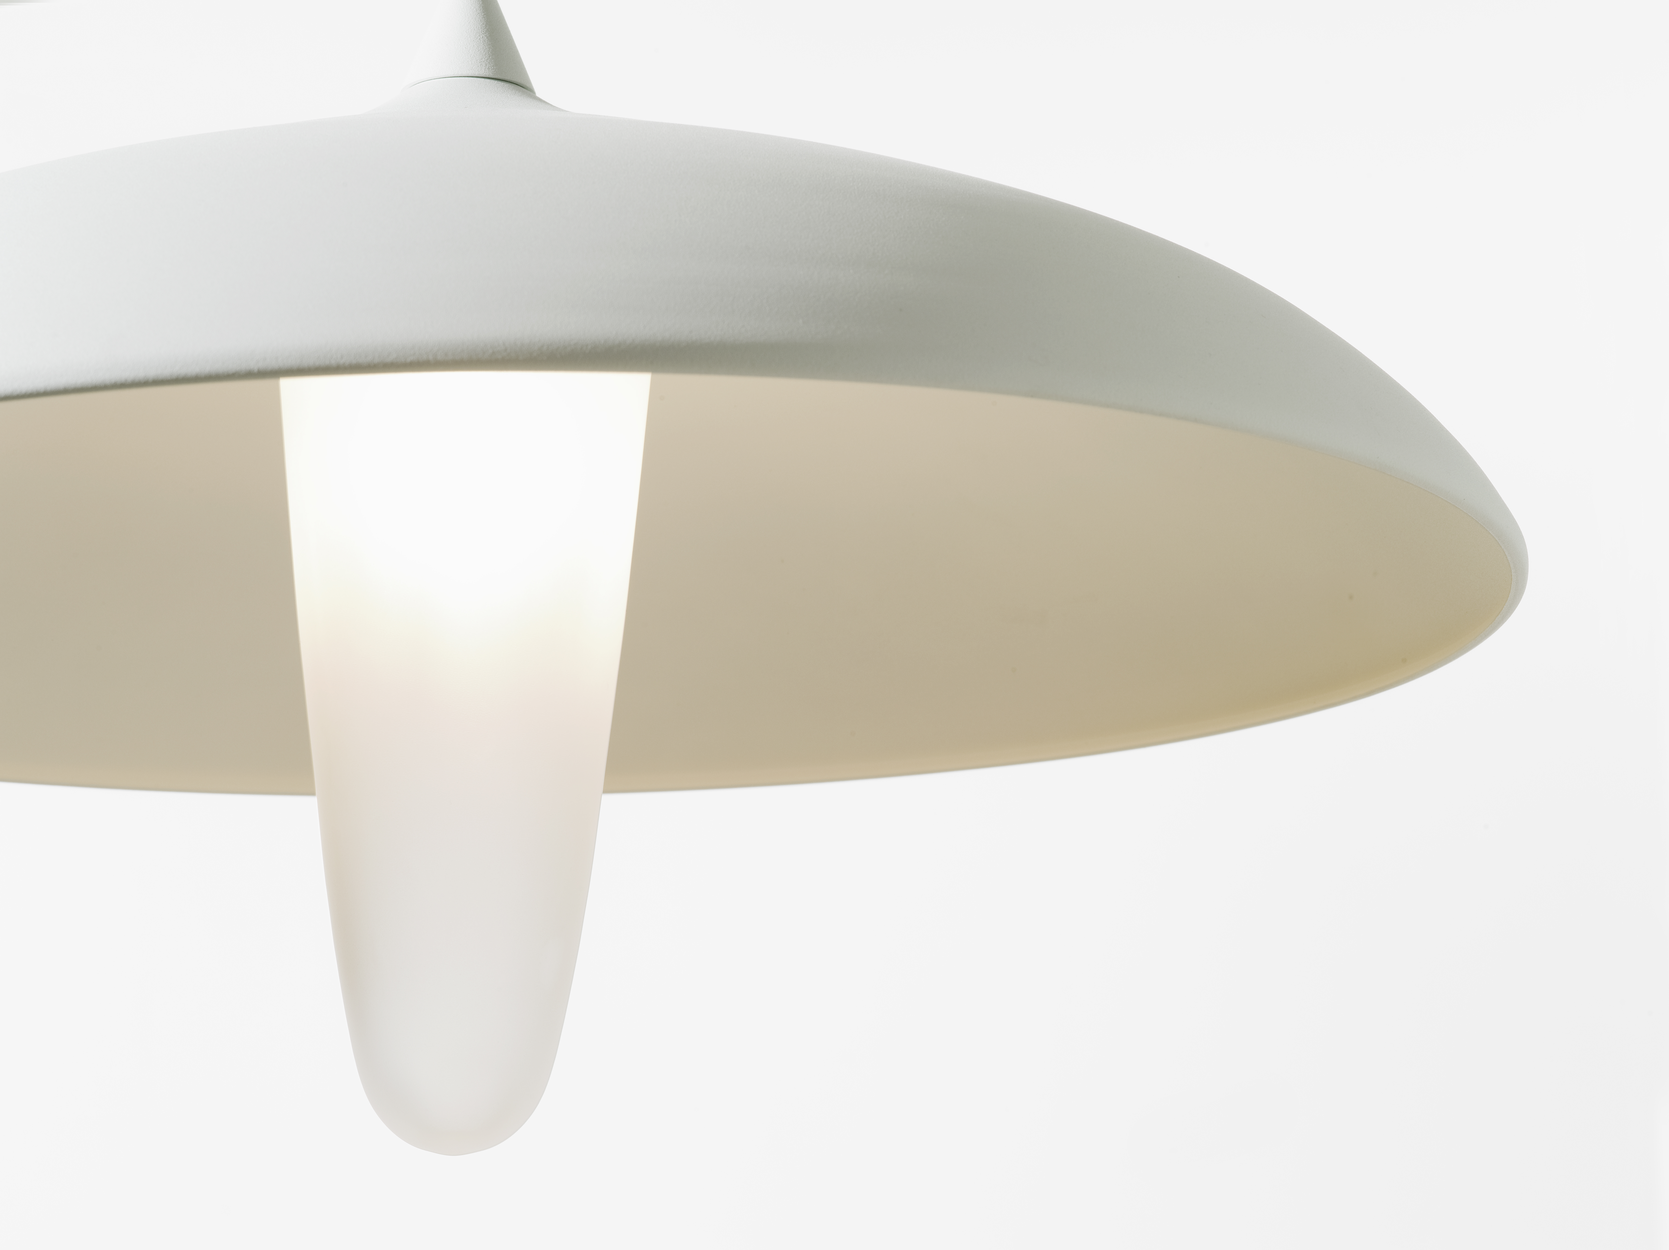 Hanglamp Aron 581 Detail Bertjan Pot Functionals Gimmii